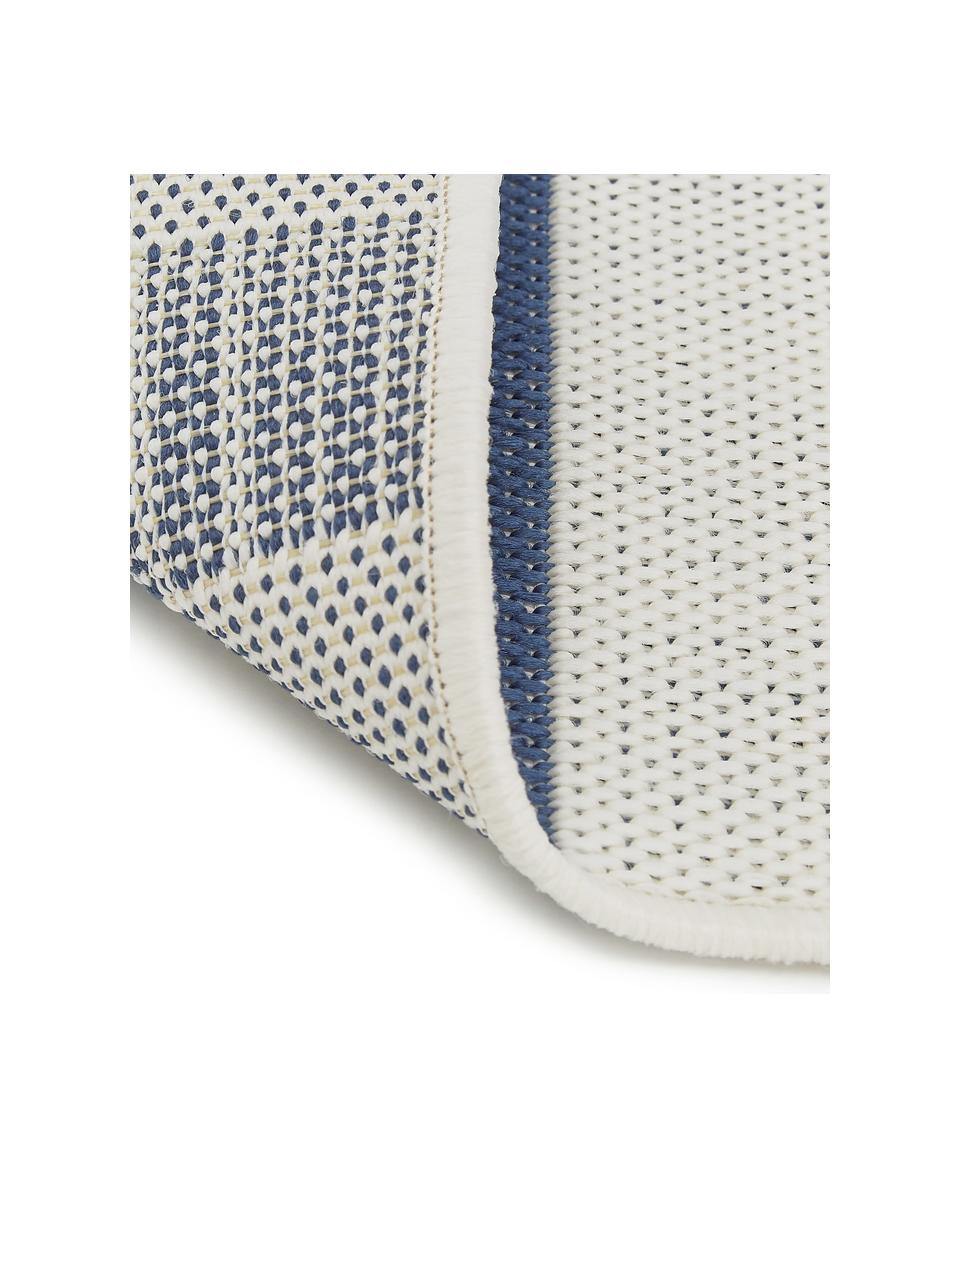 Passatoia blu/bianca a fantasia da interno-esterno Axa, 86% polipropilene, 14% poliestere, Bianco crema, blu, Larg. 80 x Lung. 250 cm